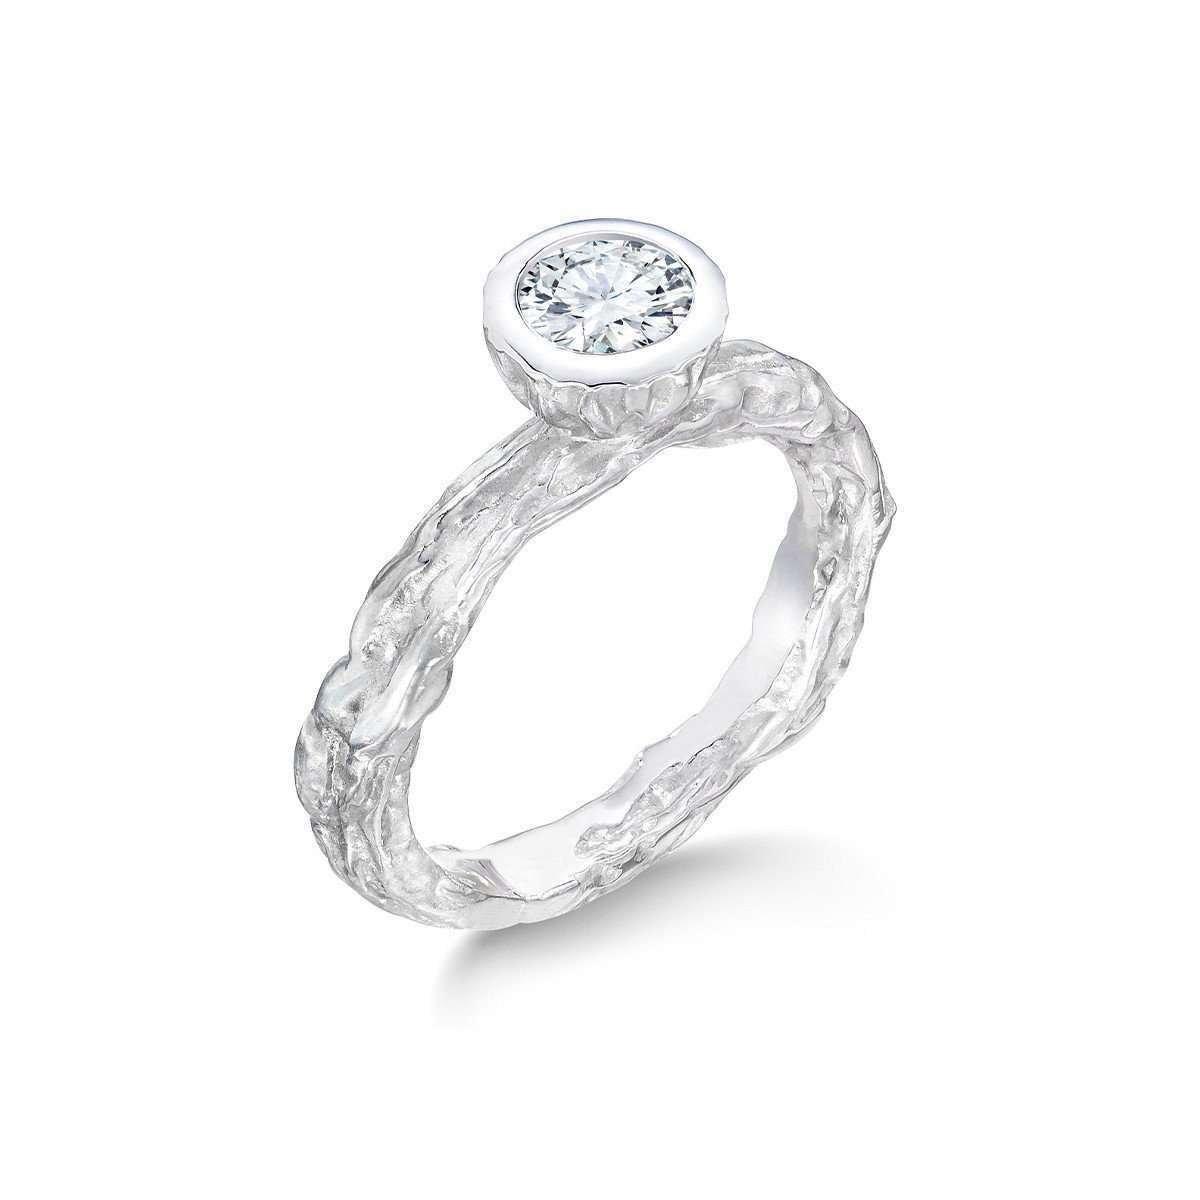 Banyan Tree Wedding-Engagement Ring White Gold - LJD Designs